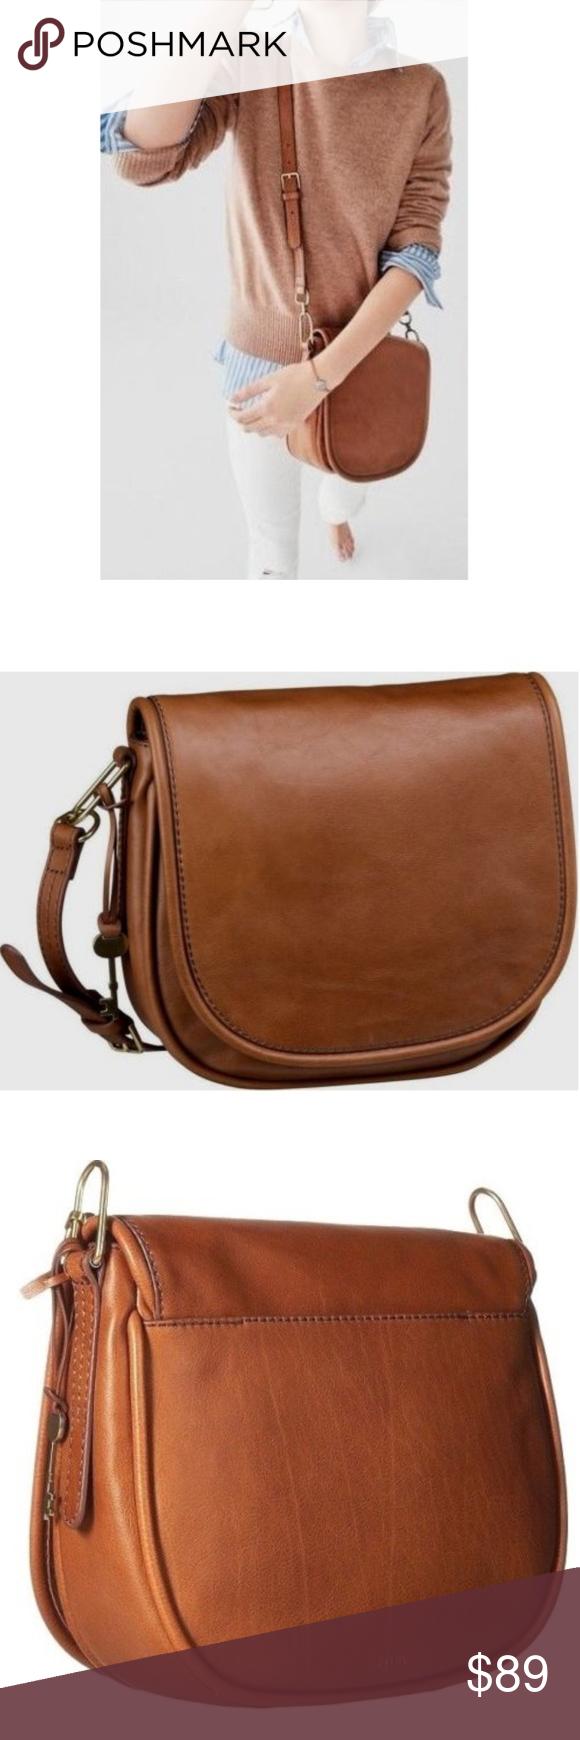 b18d1e4f5b92 Fossil Rumi Brown Leather Crossbody Bag NWT Beautiful